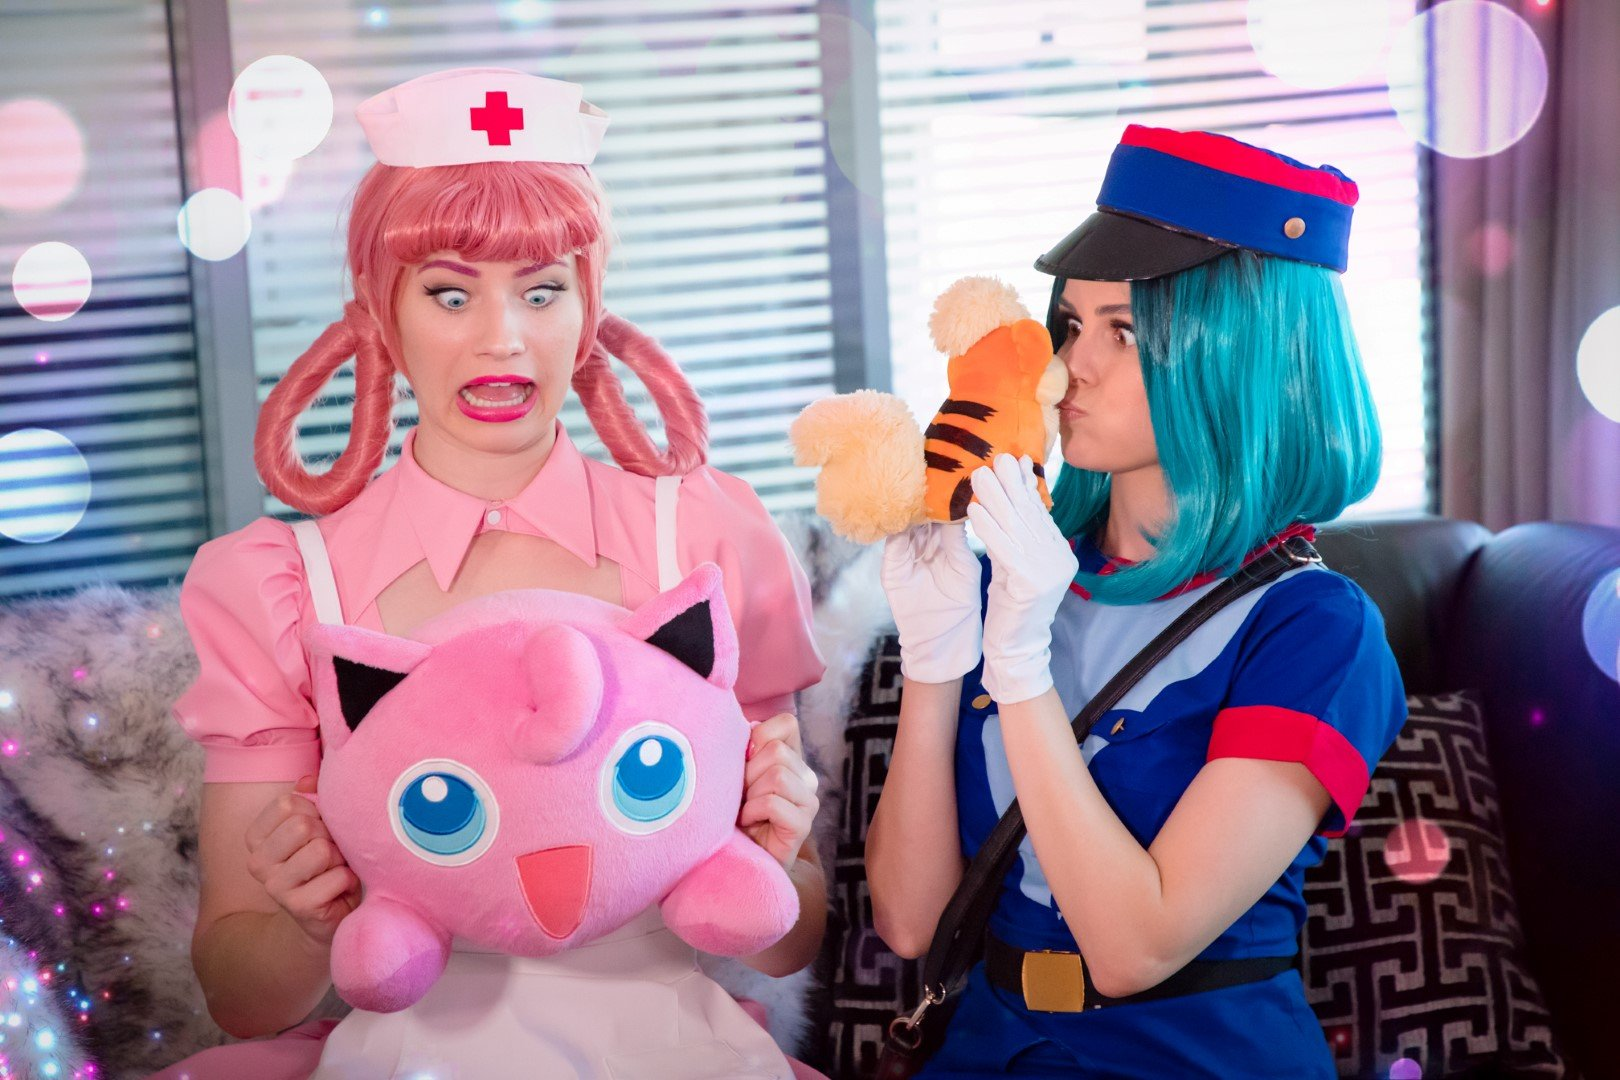 Nichameleon & Tabootie Nurse Joy Officer Jenny Cosplay Photos 0045